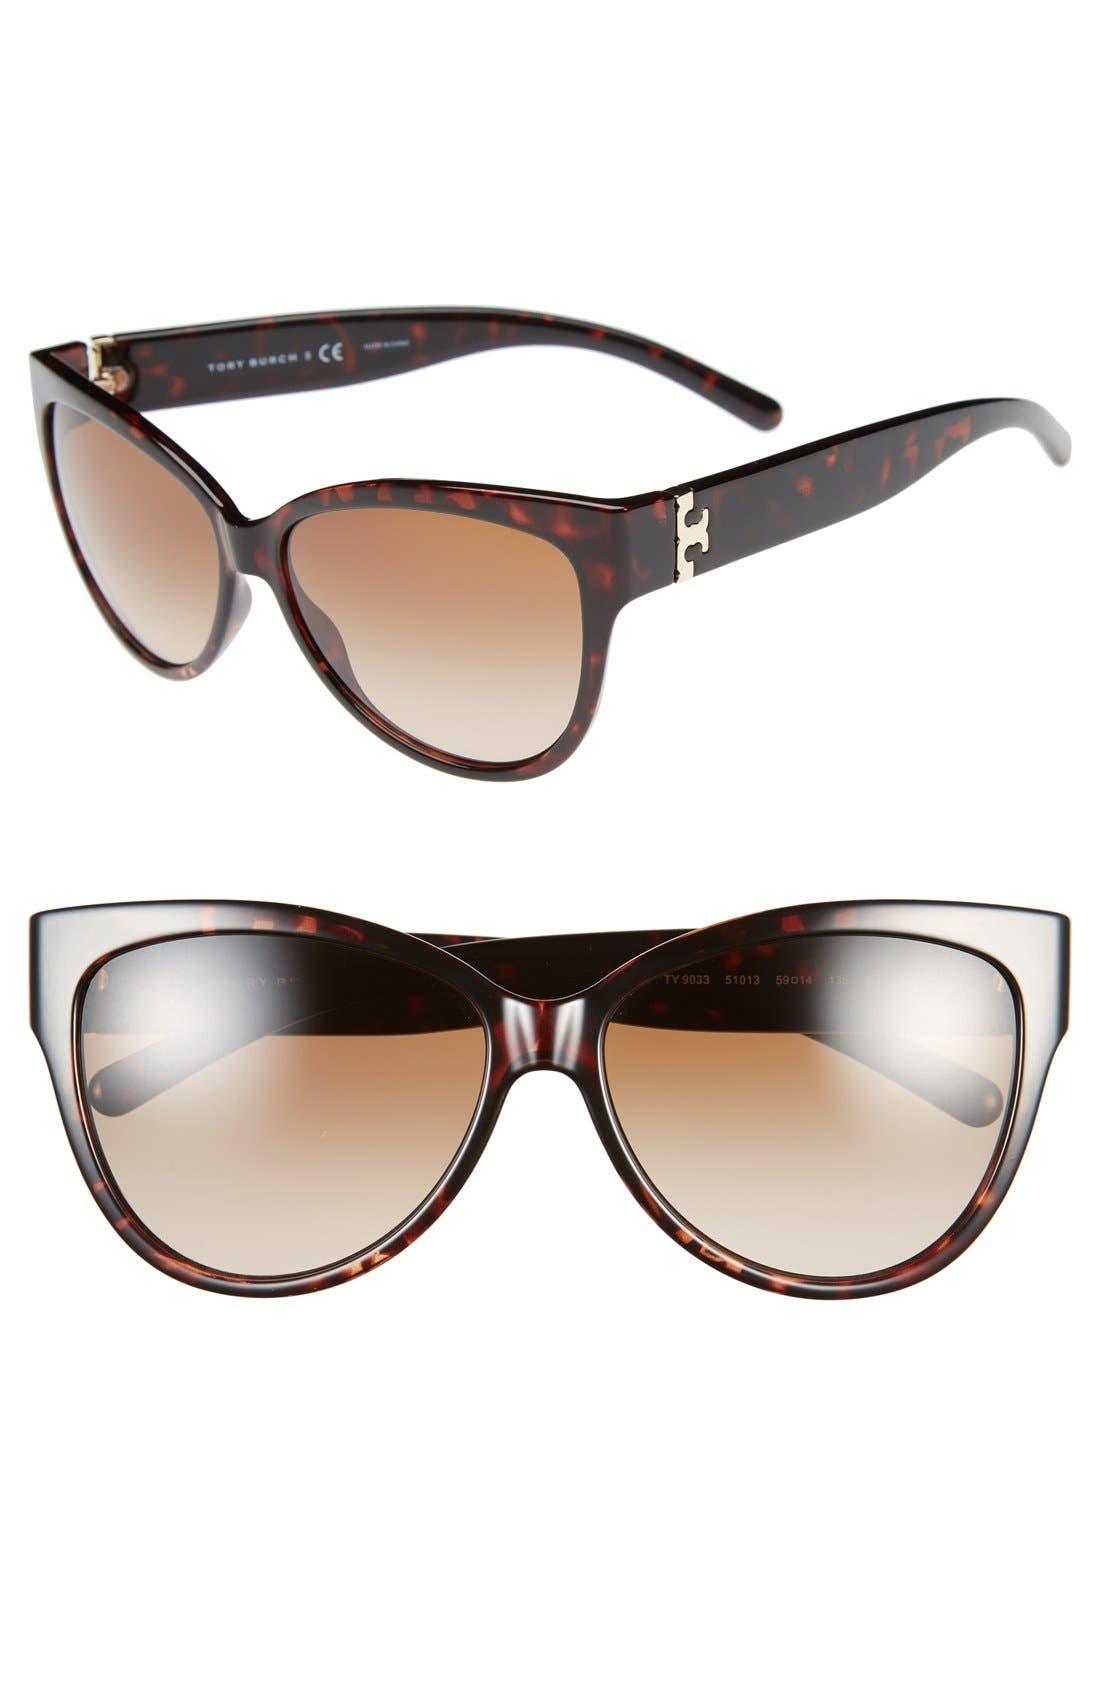 59mm Cat Eye Sunglasses,                             Main thumbnail 1, color,                             201